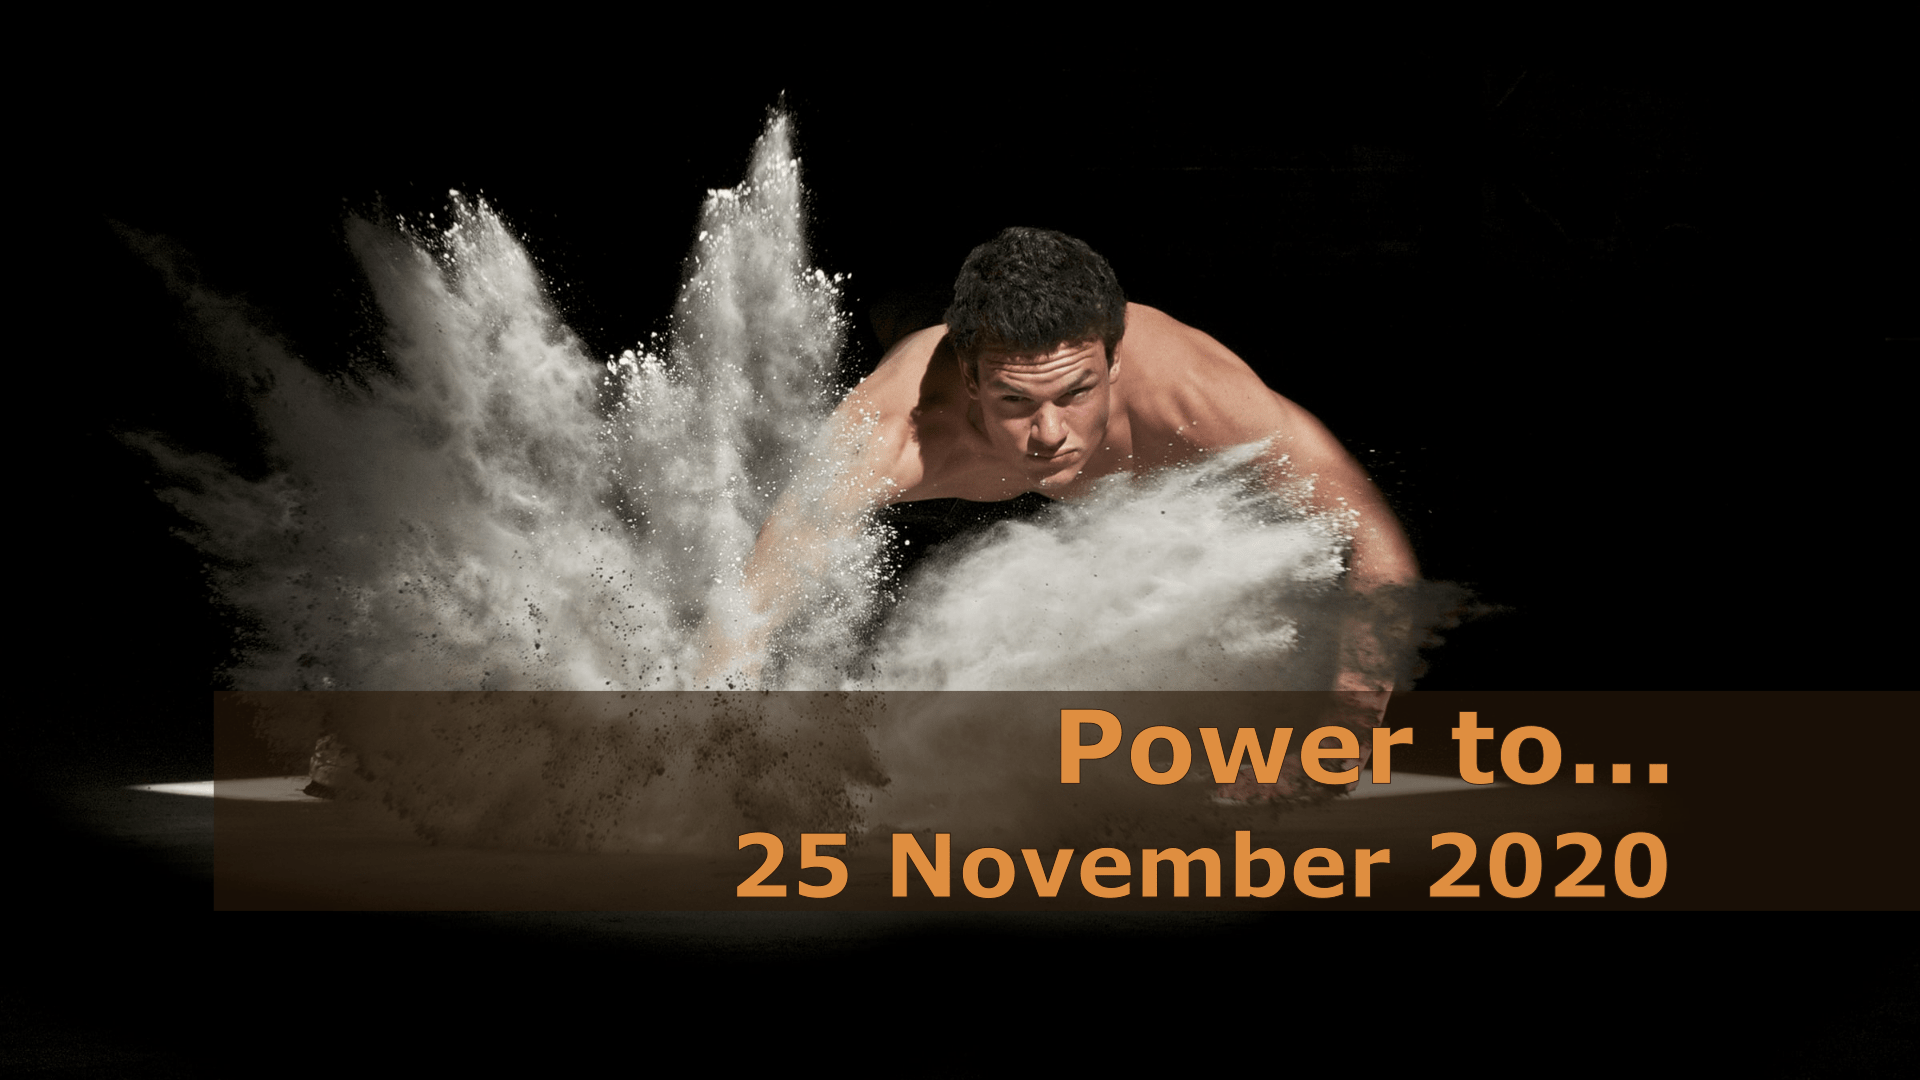 <span class='p-name'>Power to… — 25 November 2020 Devotional</span>